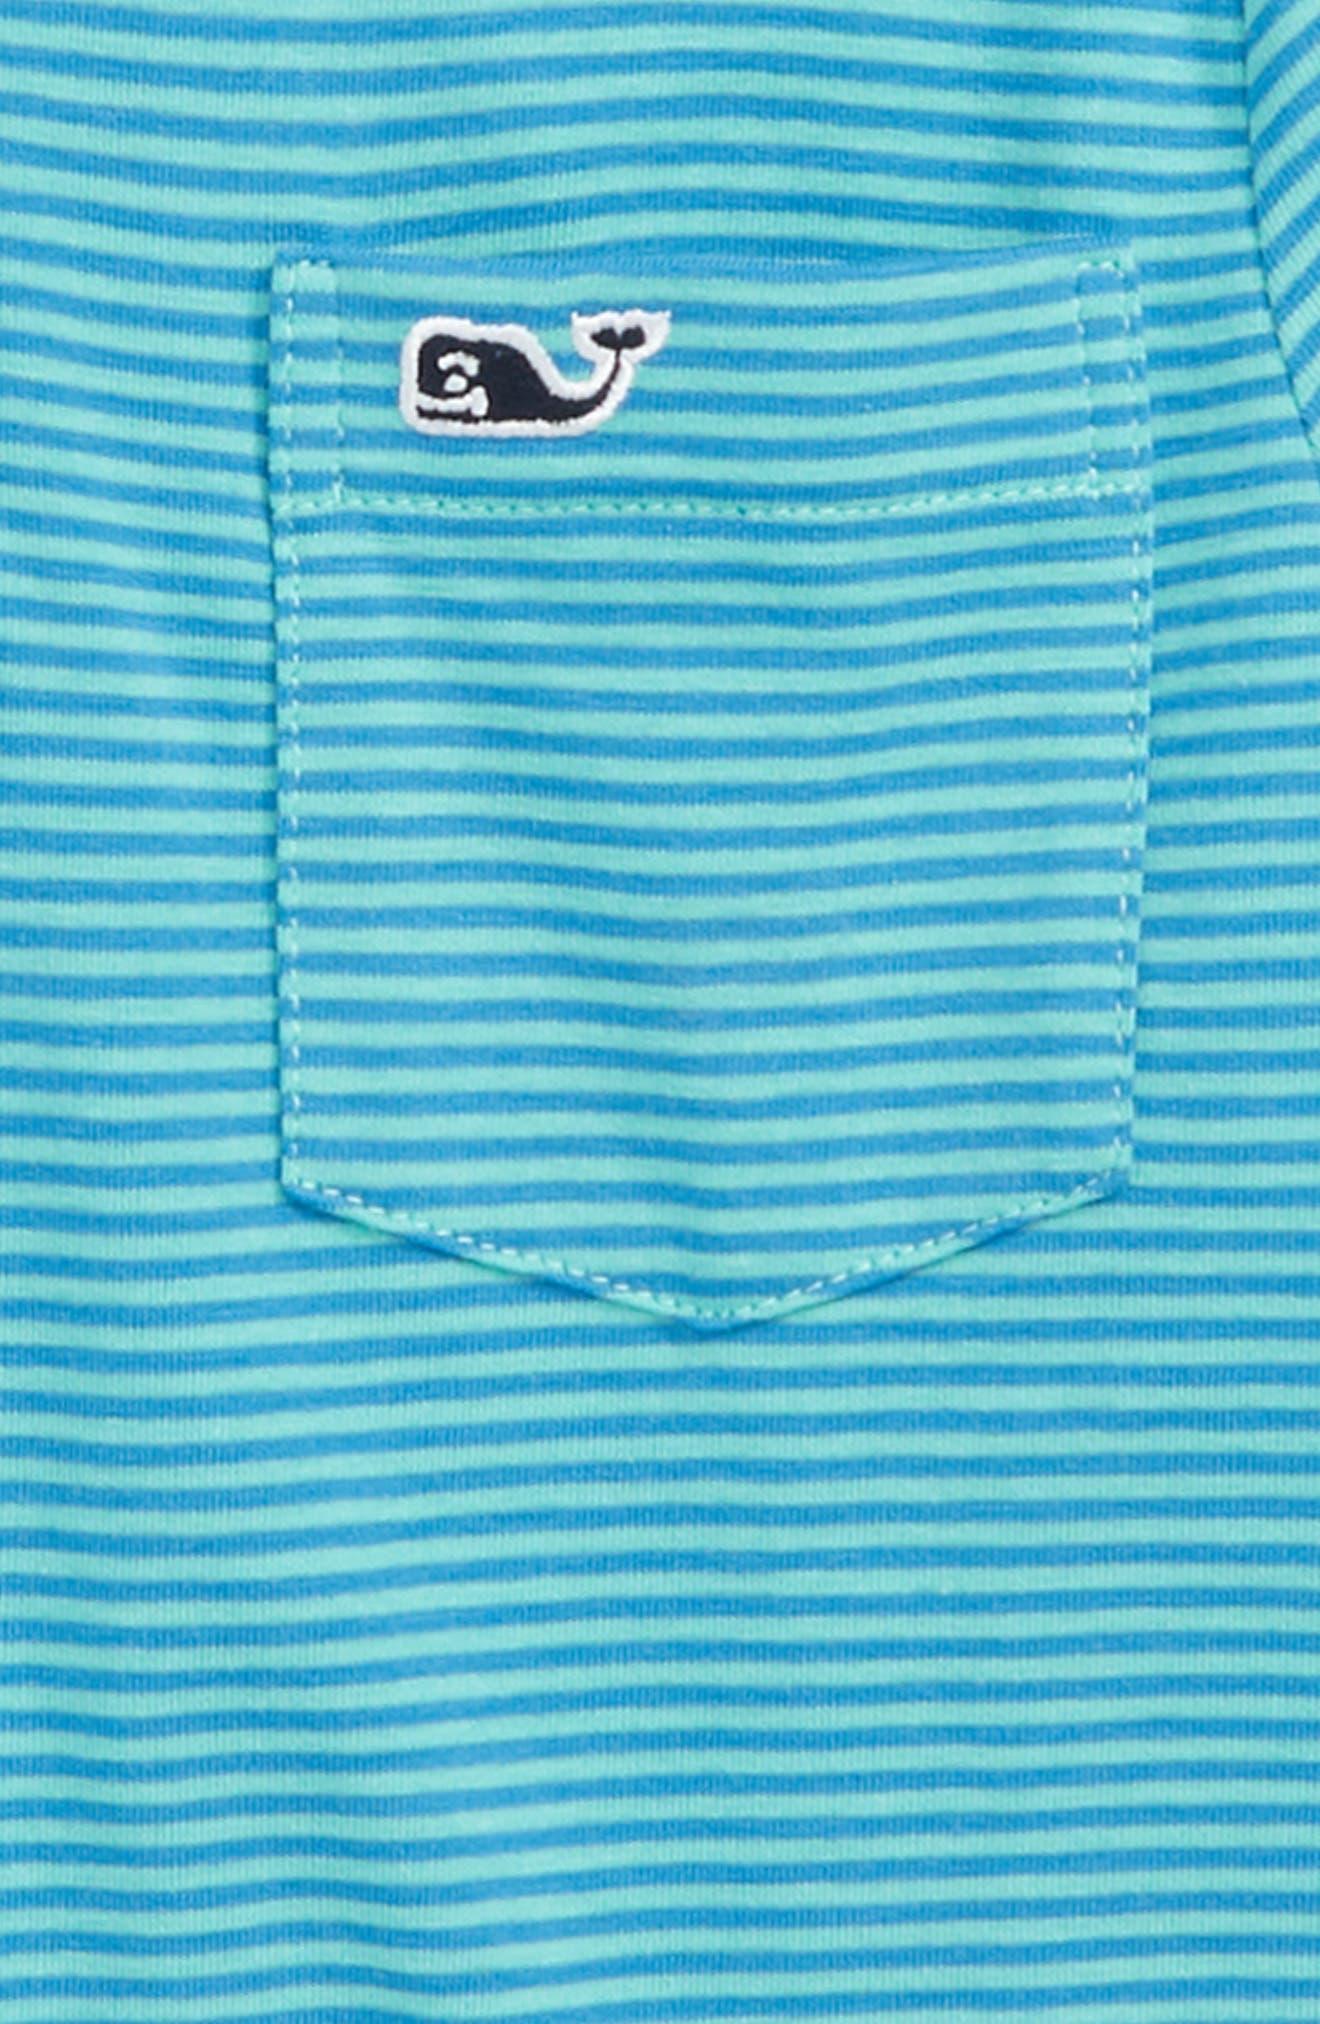 Edgartown Stripe Polo,                             Alternate thumbnail 2, color,                             Capri Blue